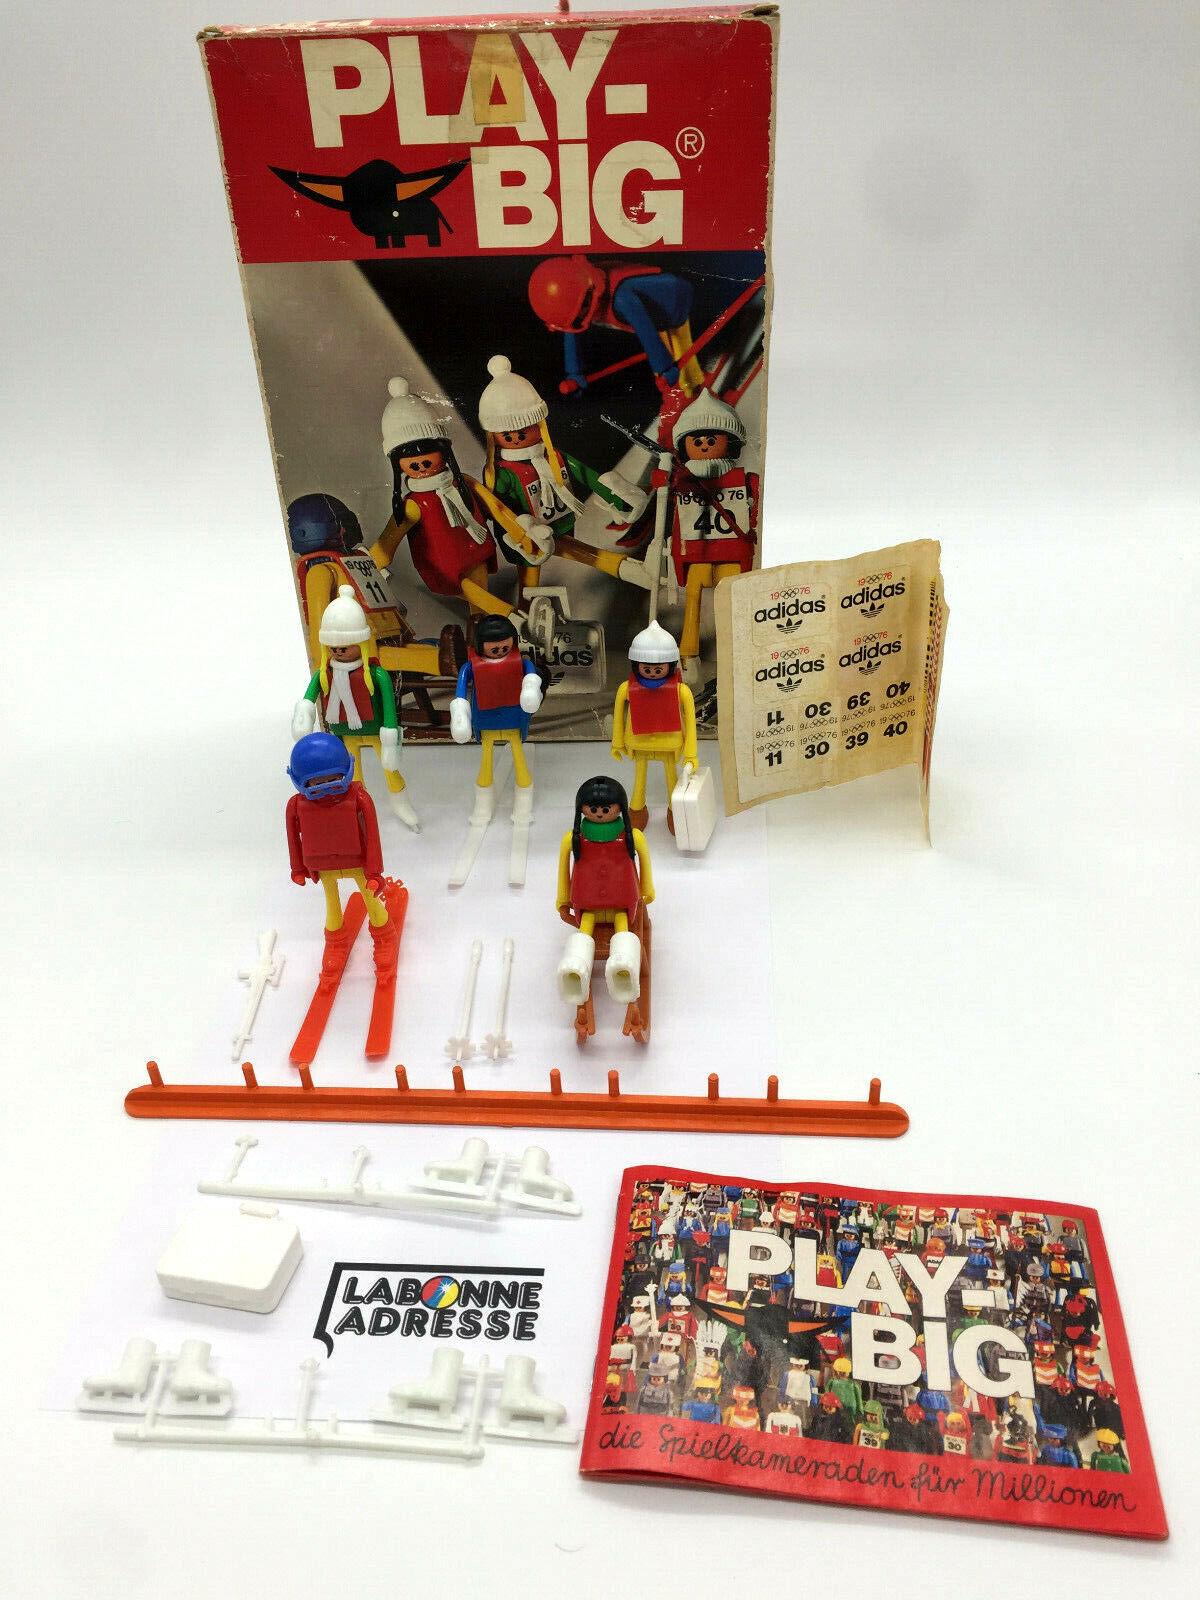 PLAYBIG 5880 ADIDAS 1976 JO  HIVER - PLAYMOBIL - VINTAGE RARE  acheter des rabais